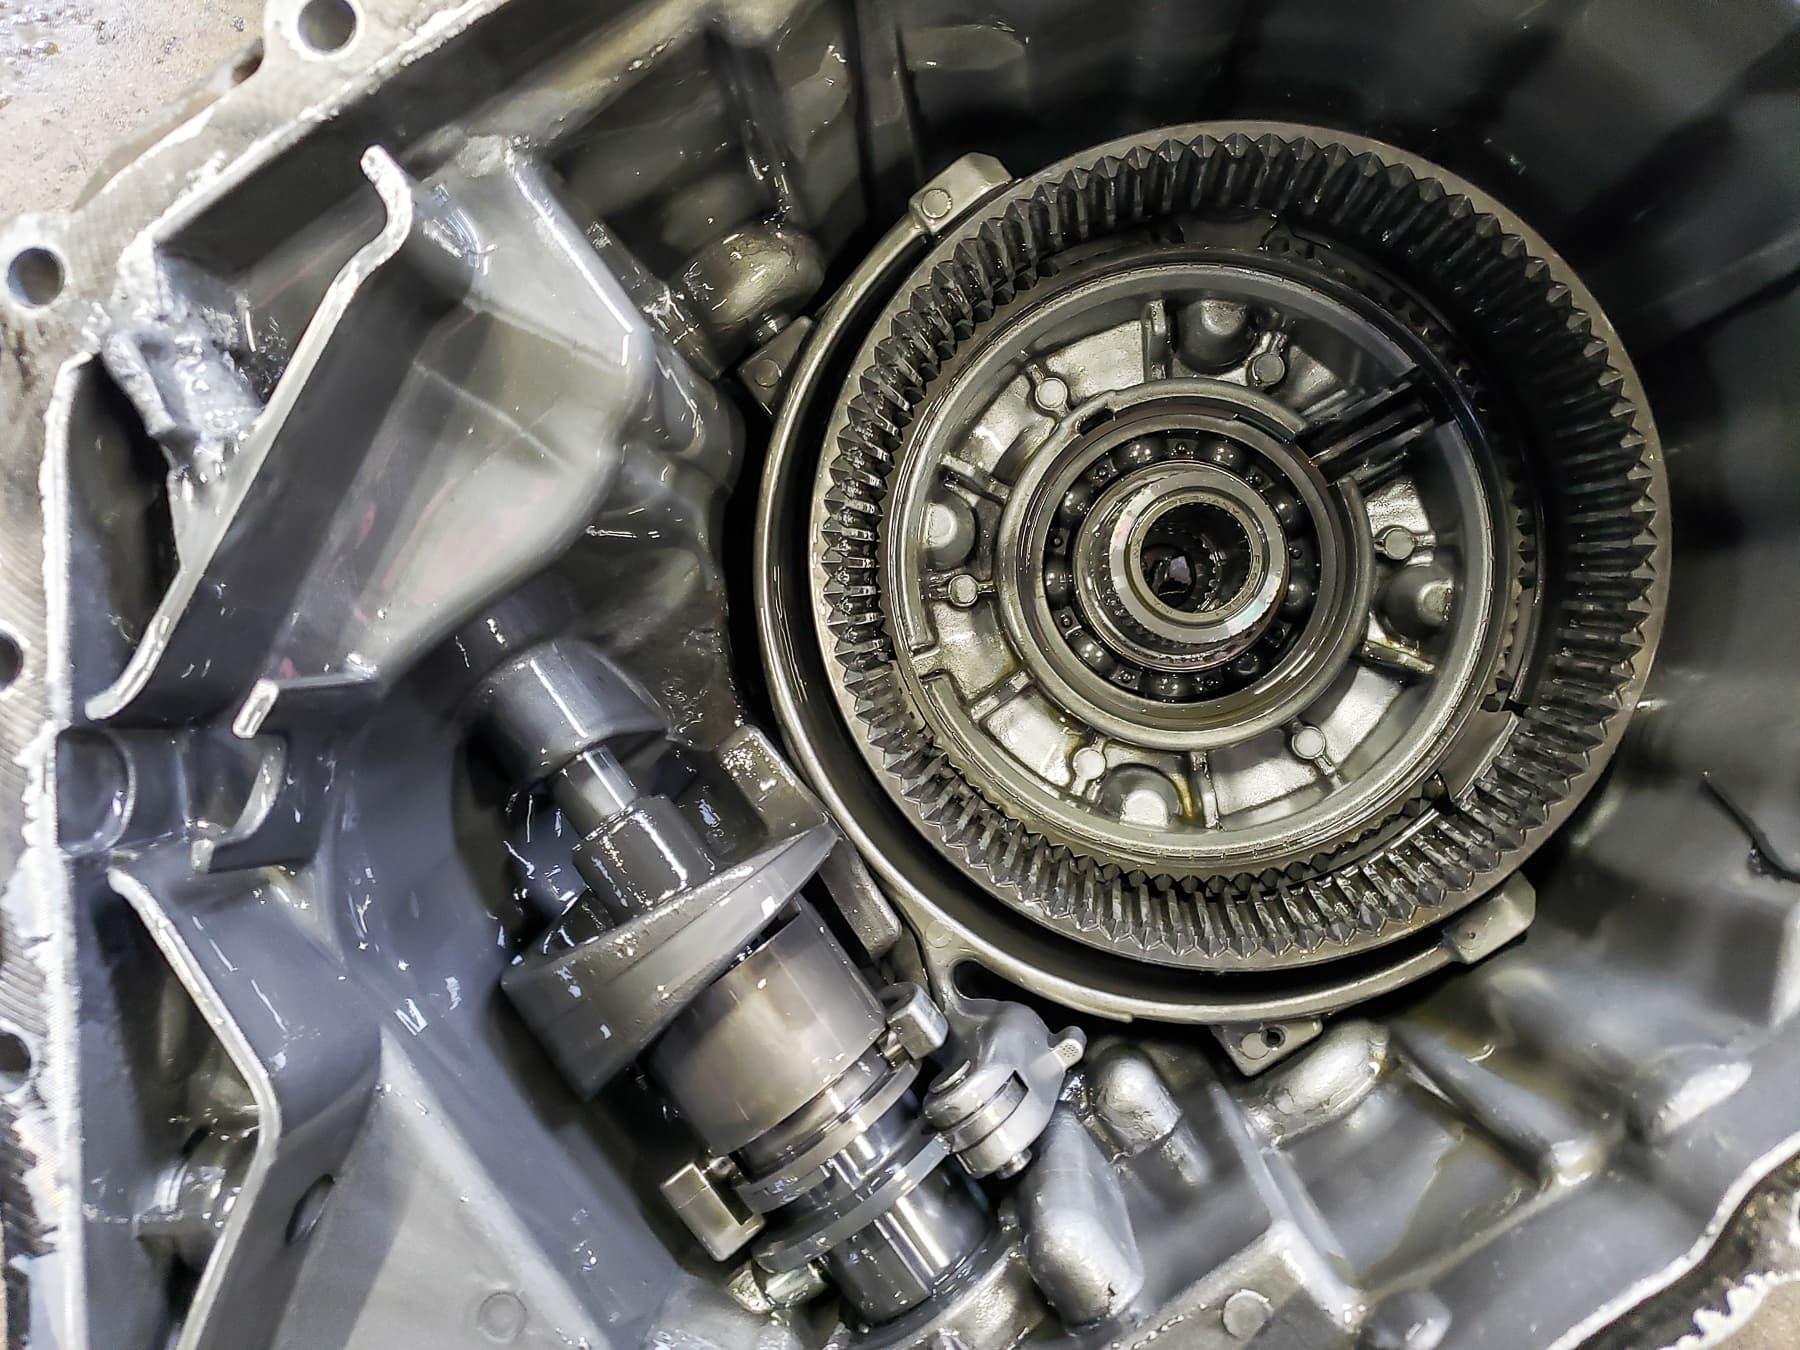 2006 Land Rover LR3 Transfer Case Repair